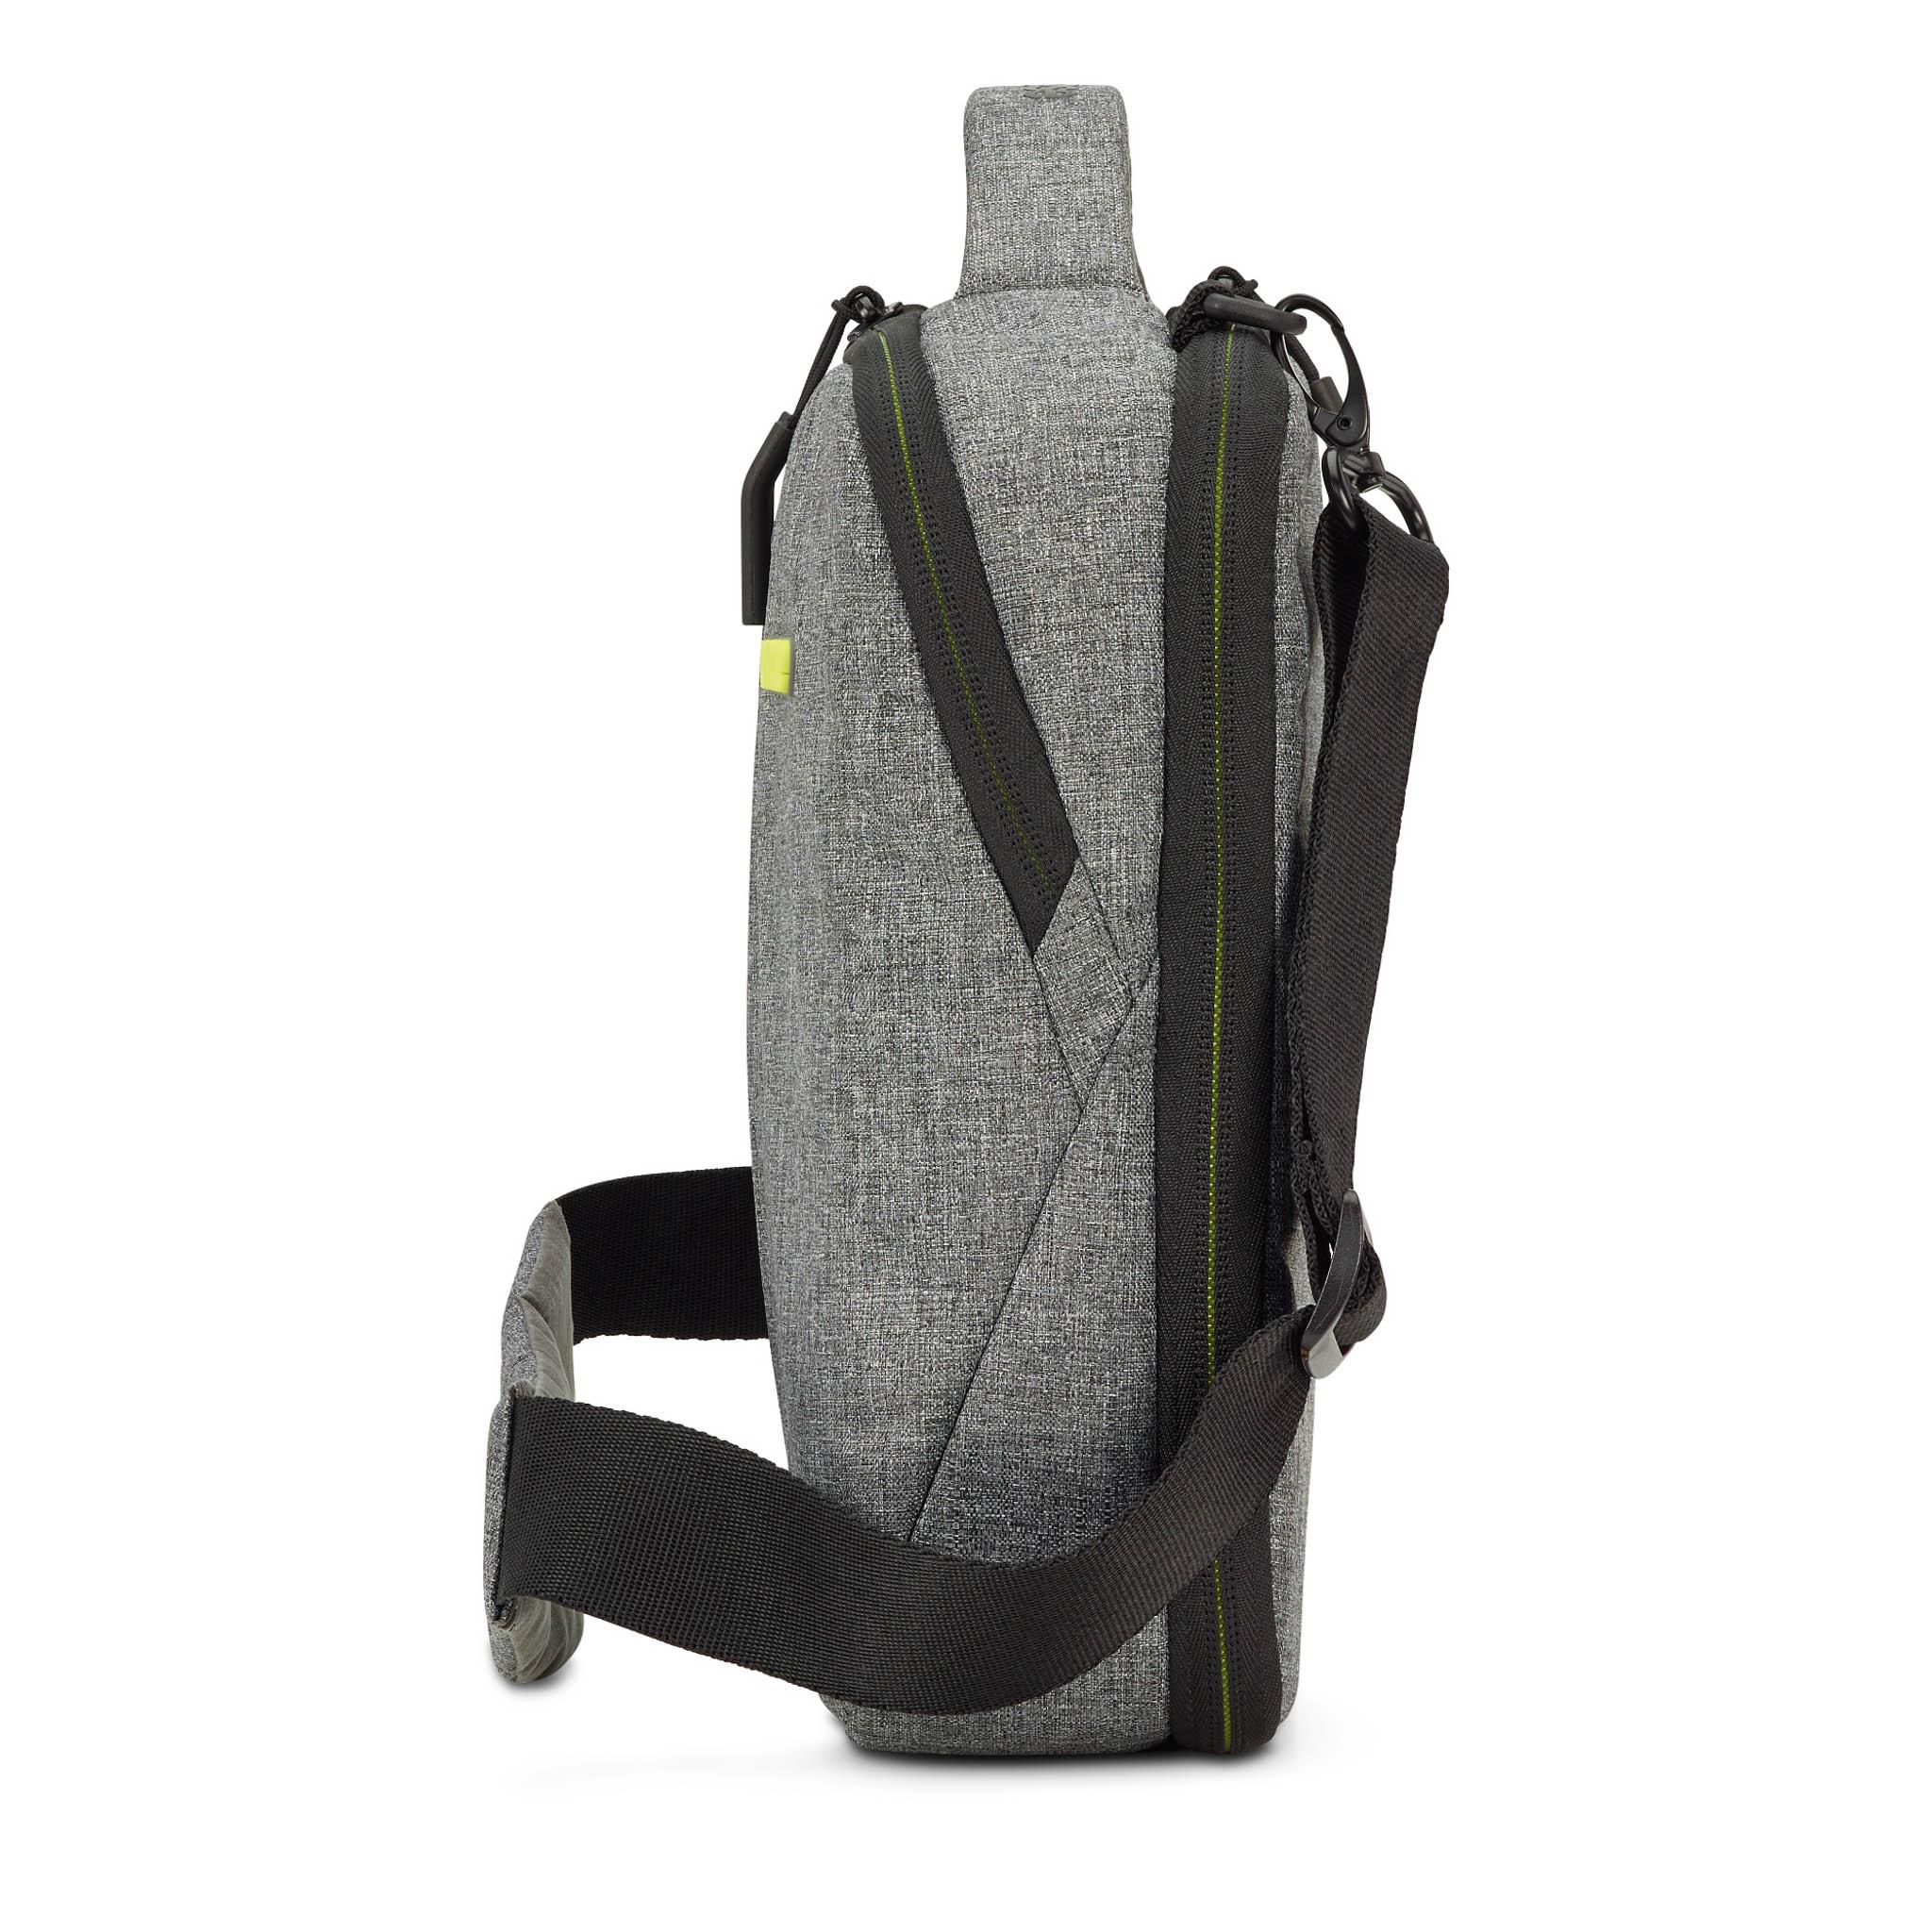 Incase Reform Collection Tensaerlite Bag-2